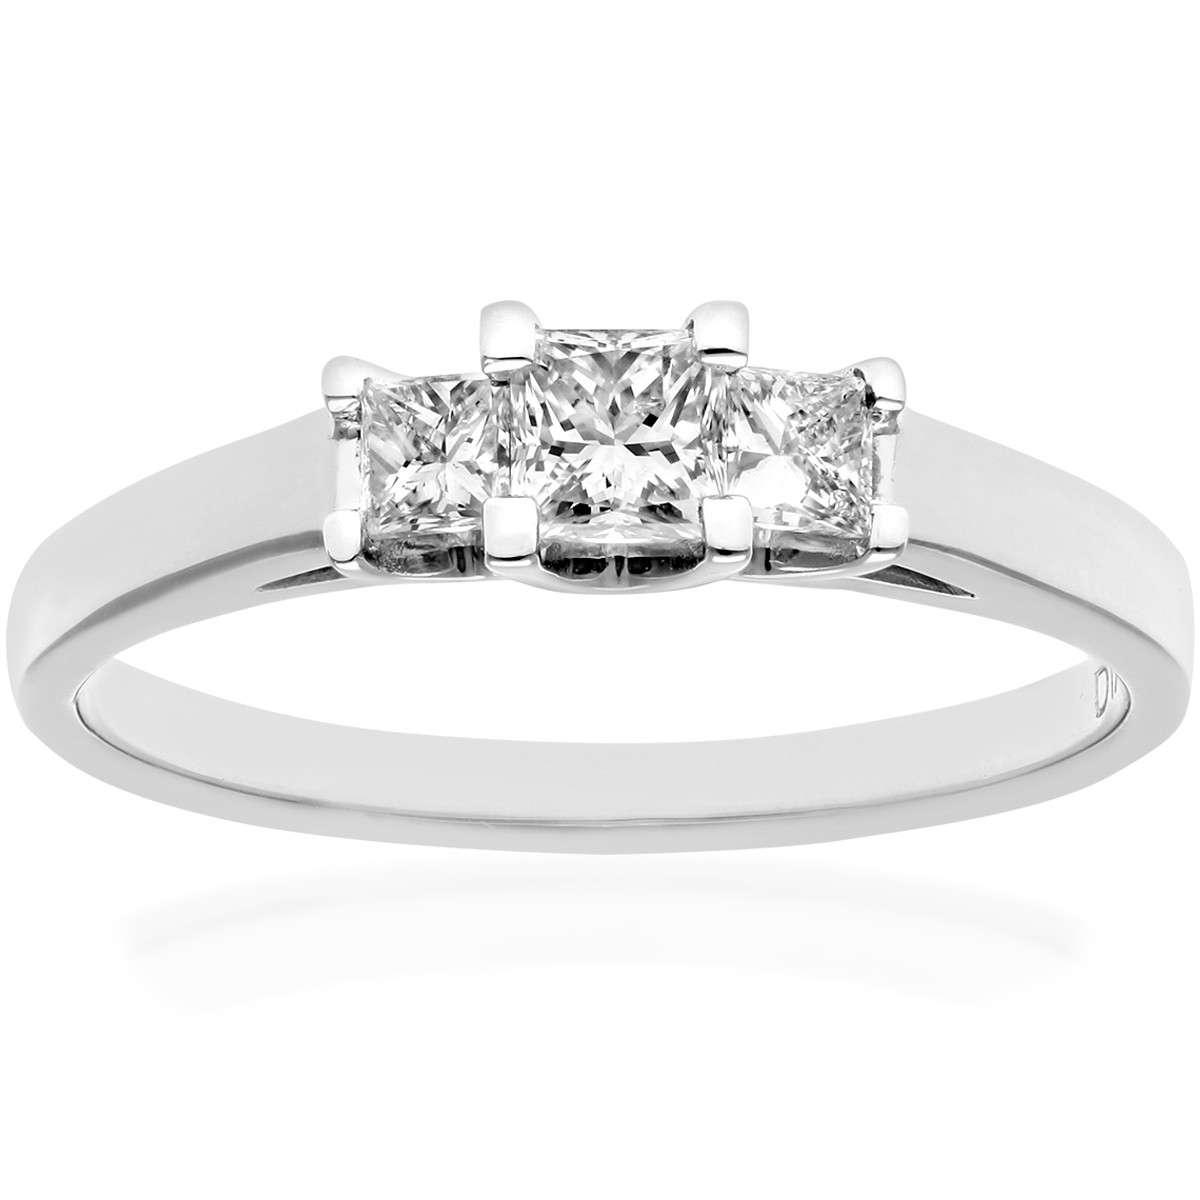 18CT WHITE GOLD 0.50CT DIAMOND PRINCESS CUT 3 STONE RING